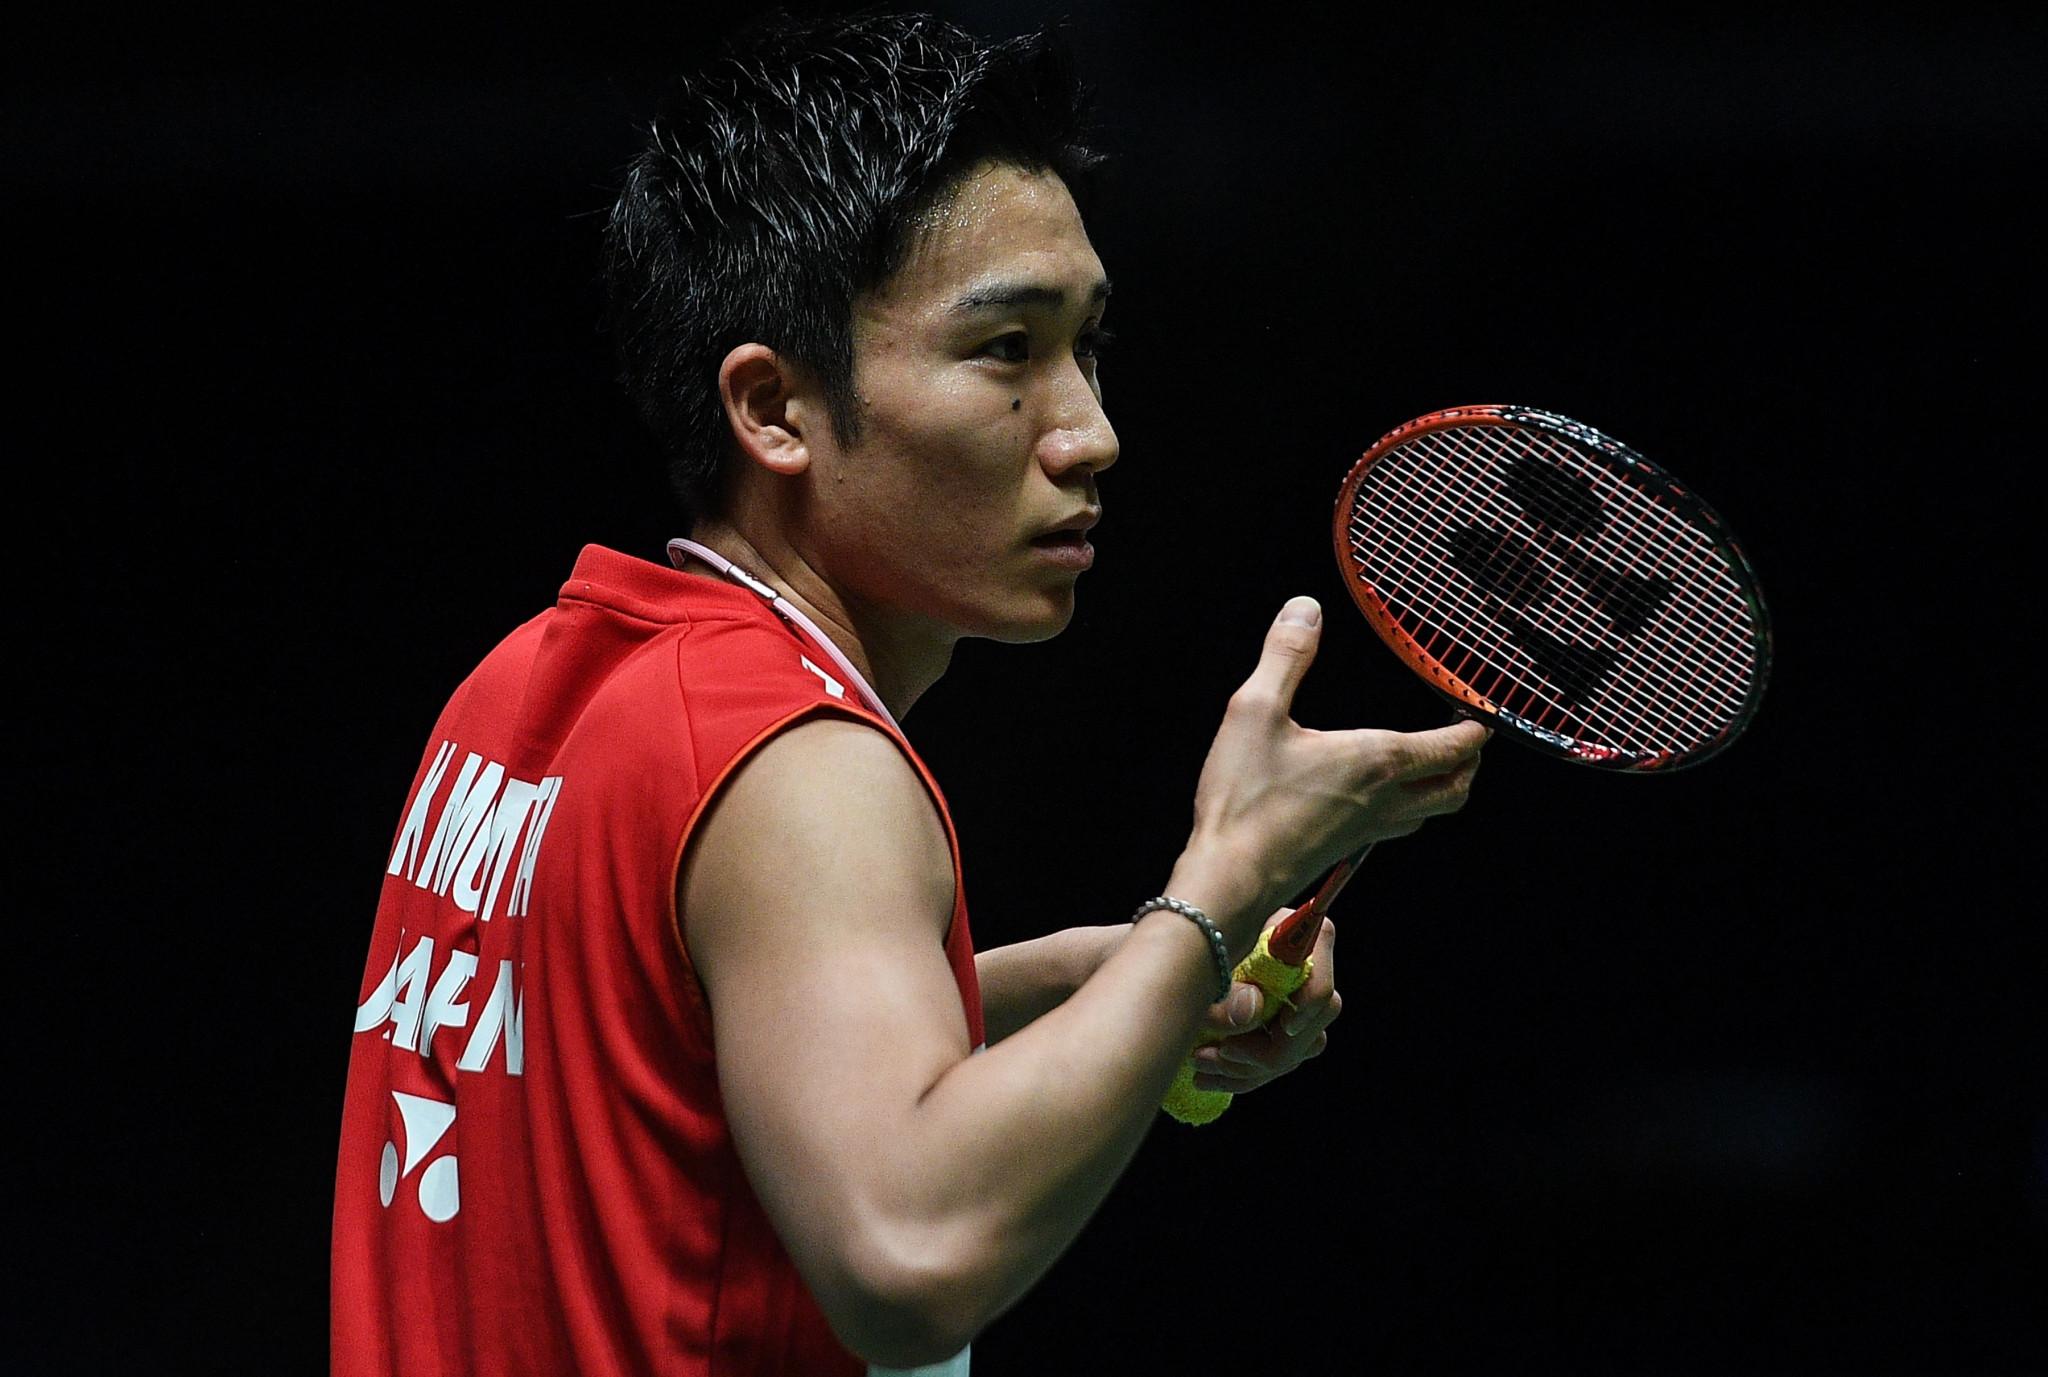 World number one badminton player Momota injured in crash that killed driver